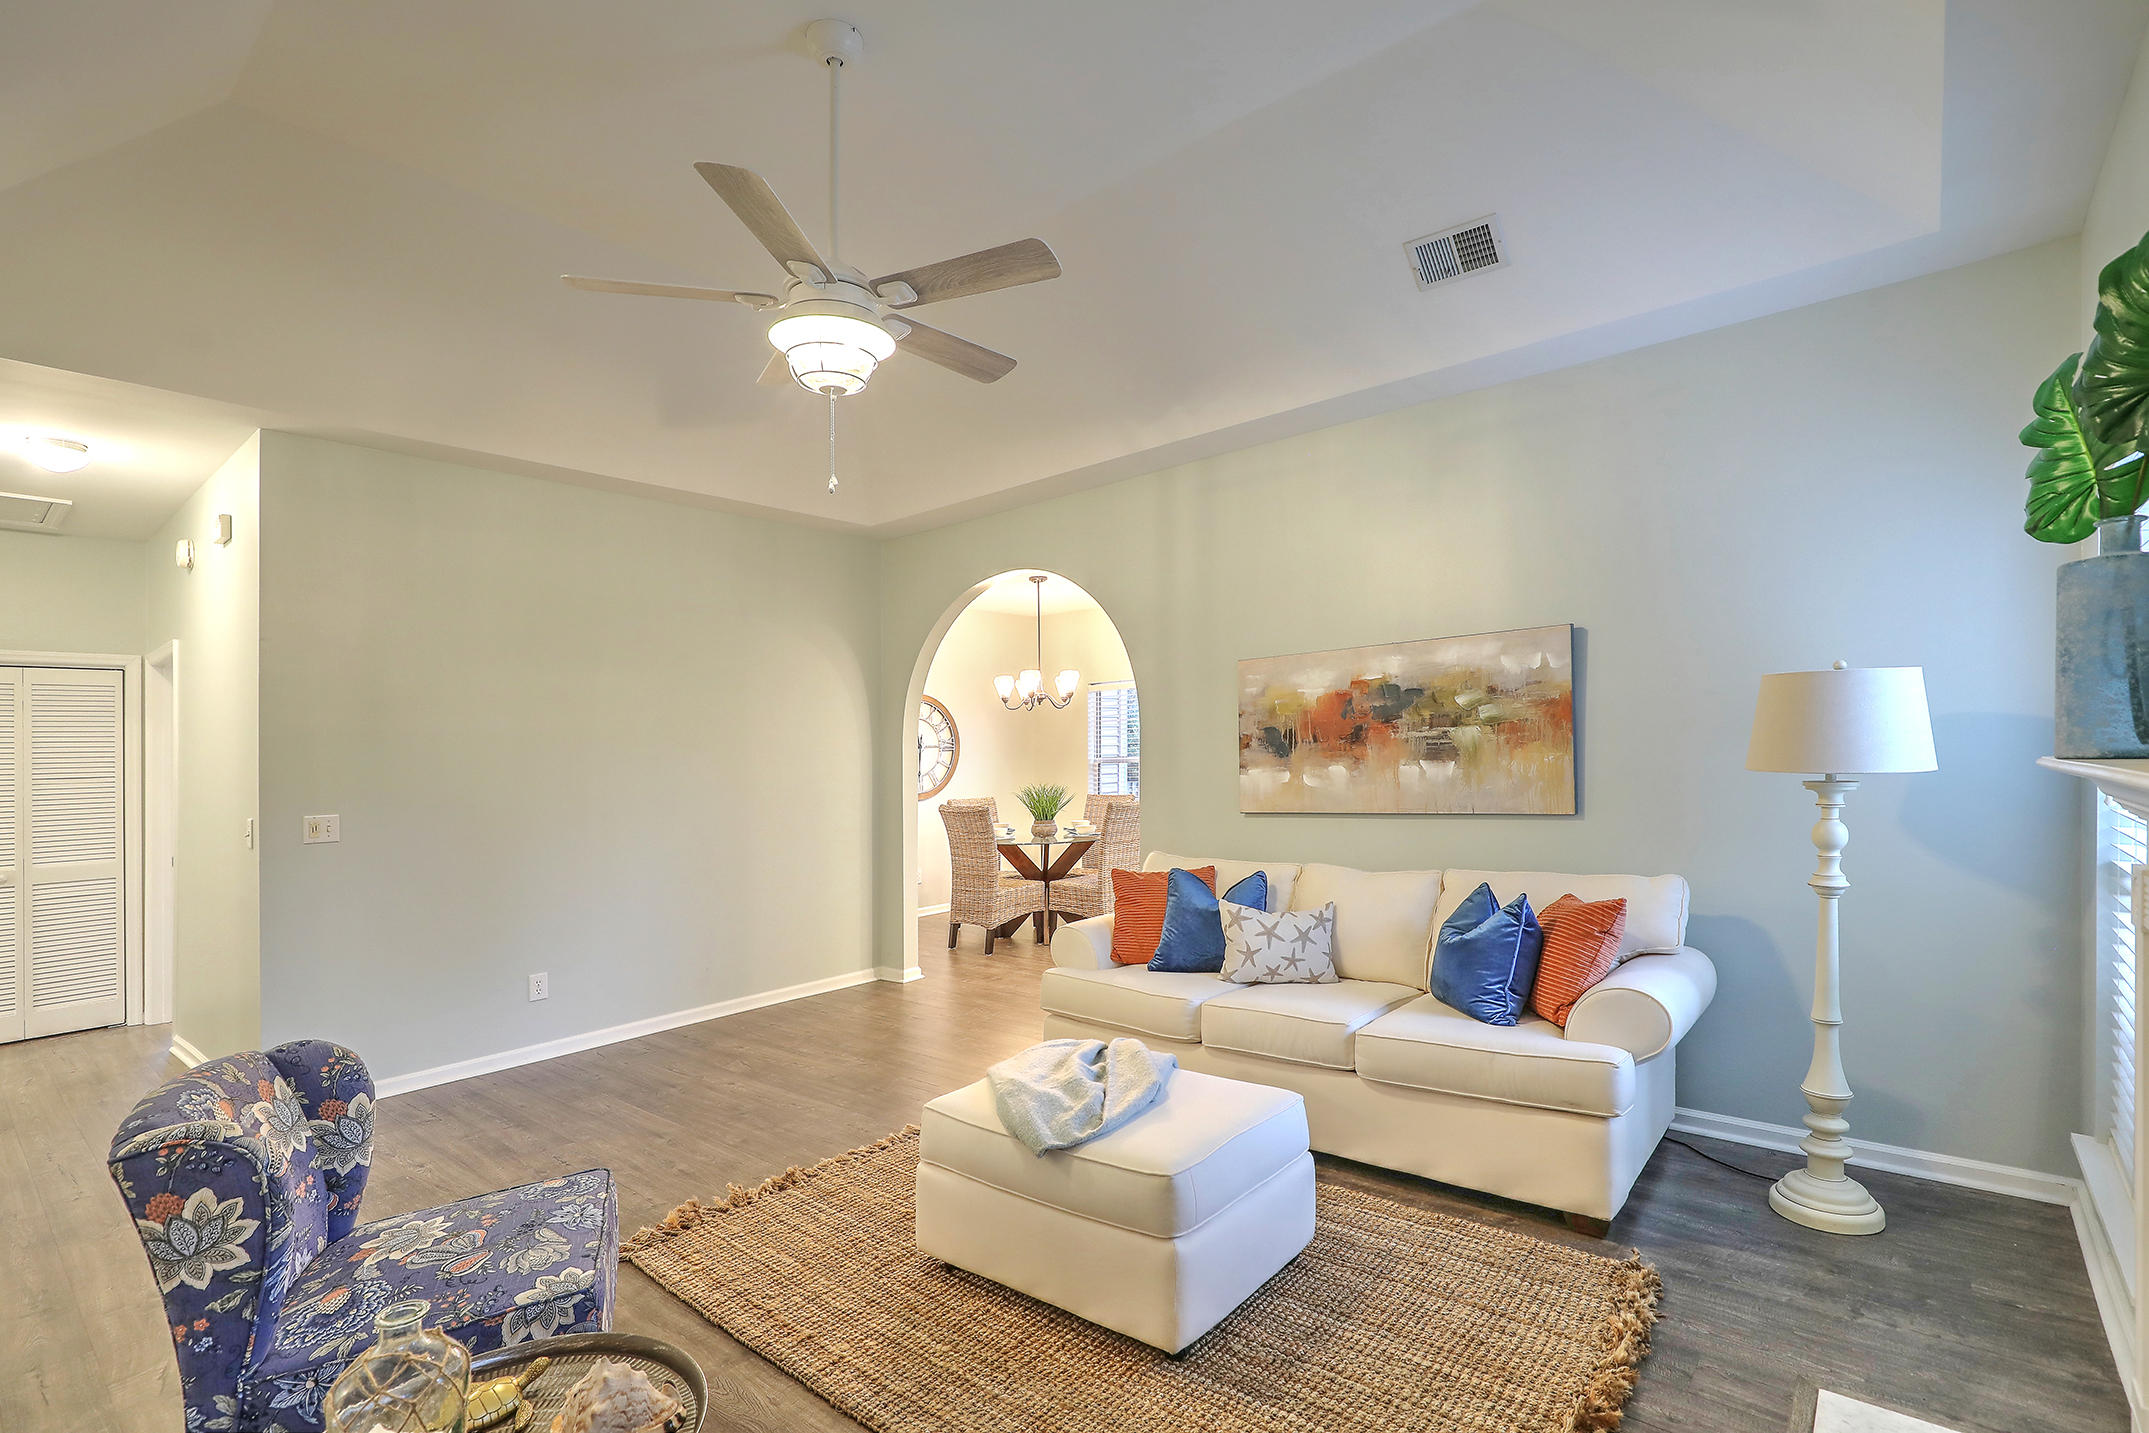 Dunes West Homes For Sale - 1309 Sassafrass, Mount Pleasant, SC - 30